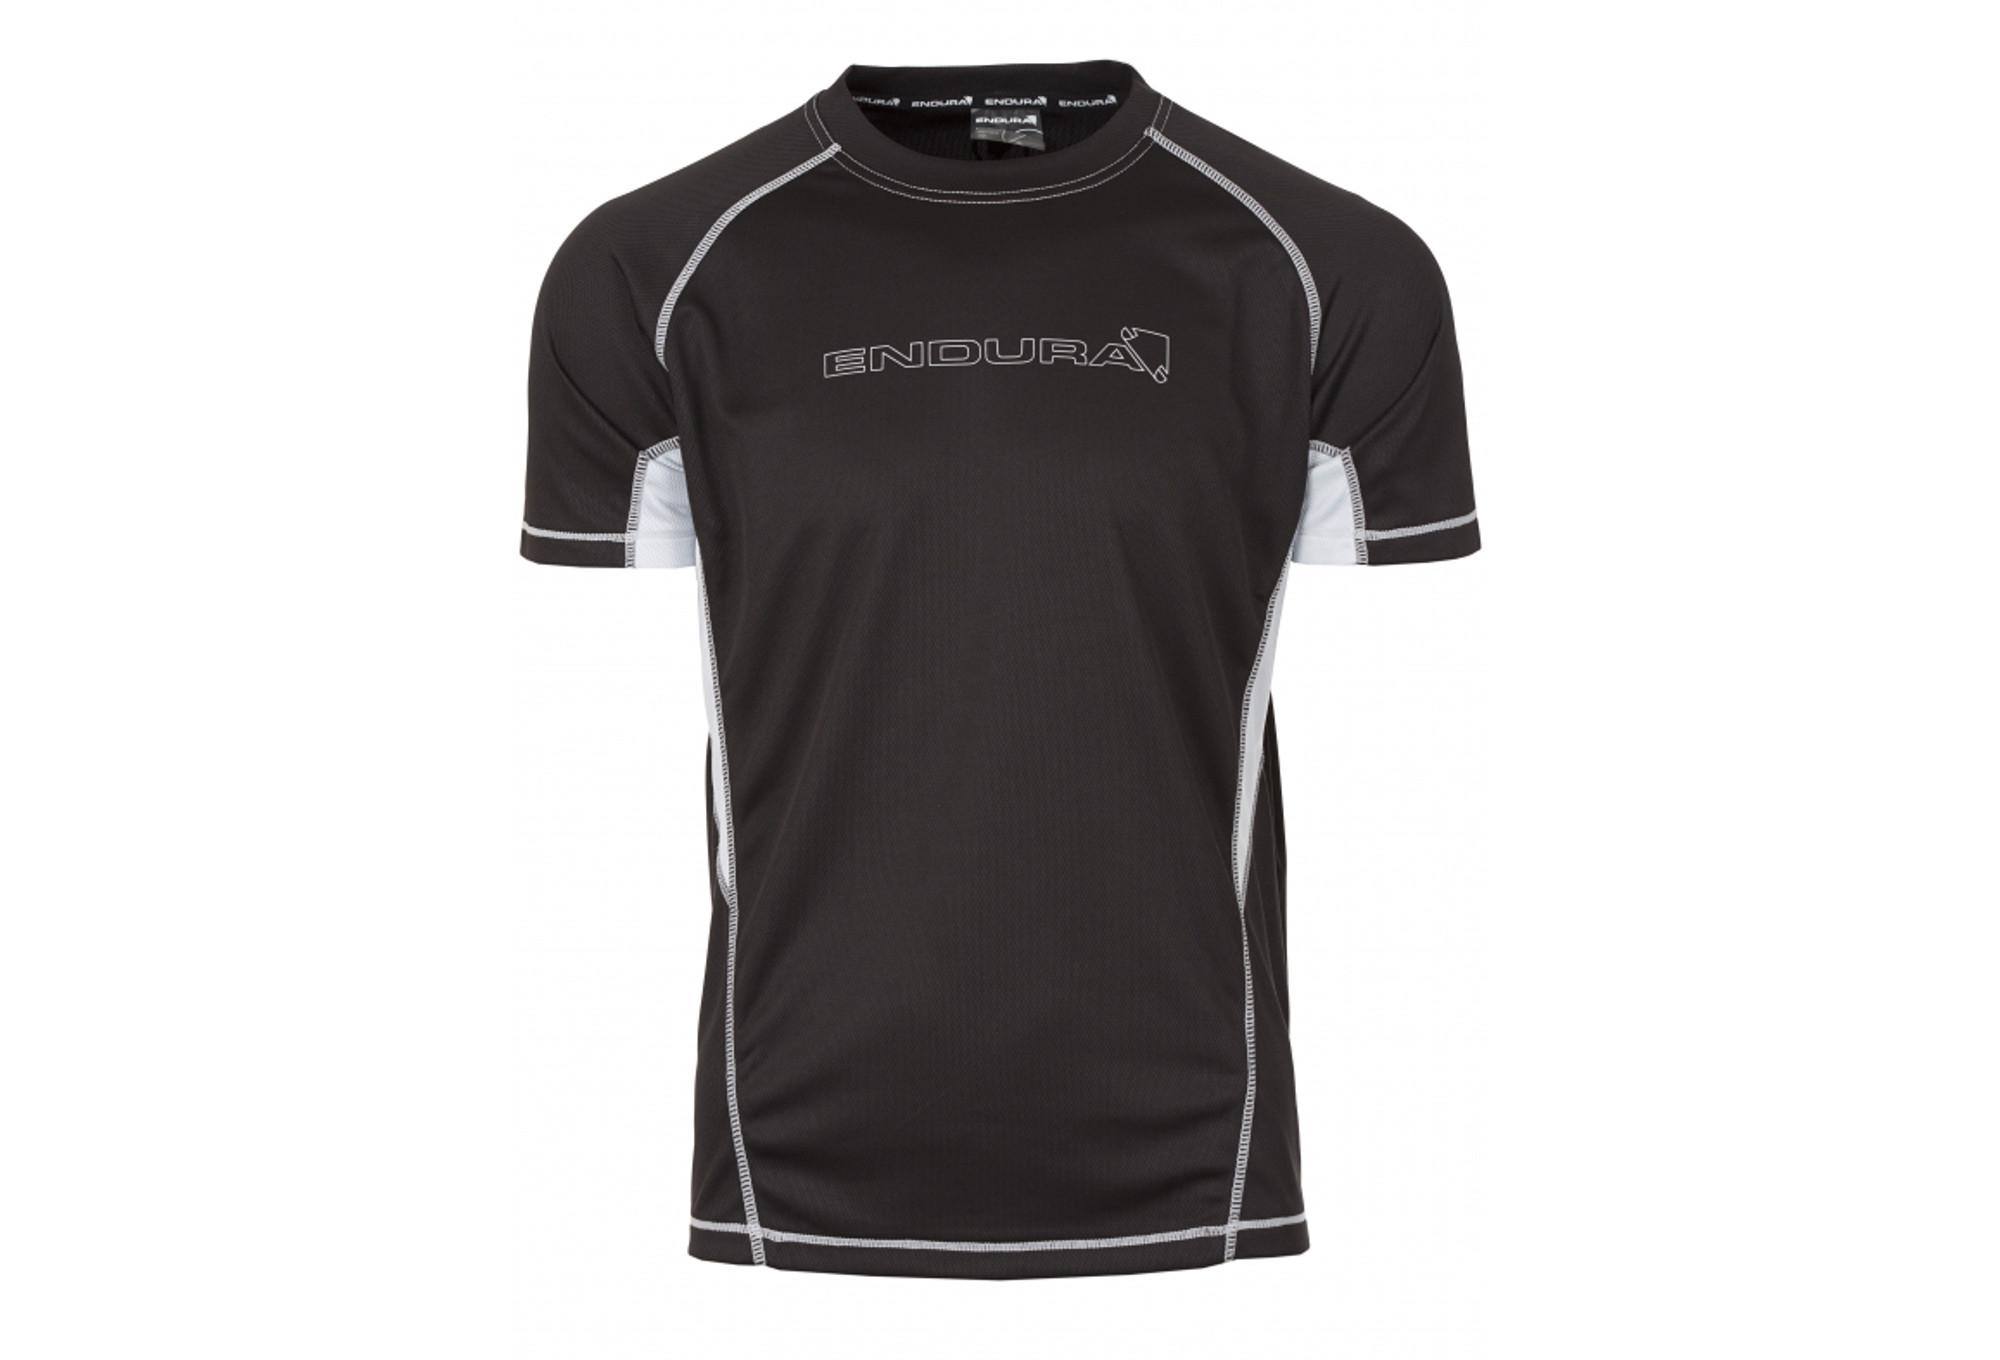 ef42ba793 ENDURA short sleeve jersey Black CAIRN